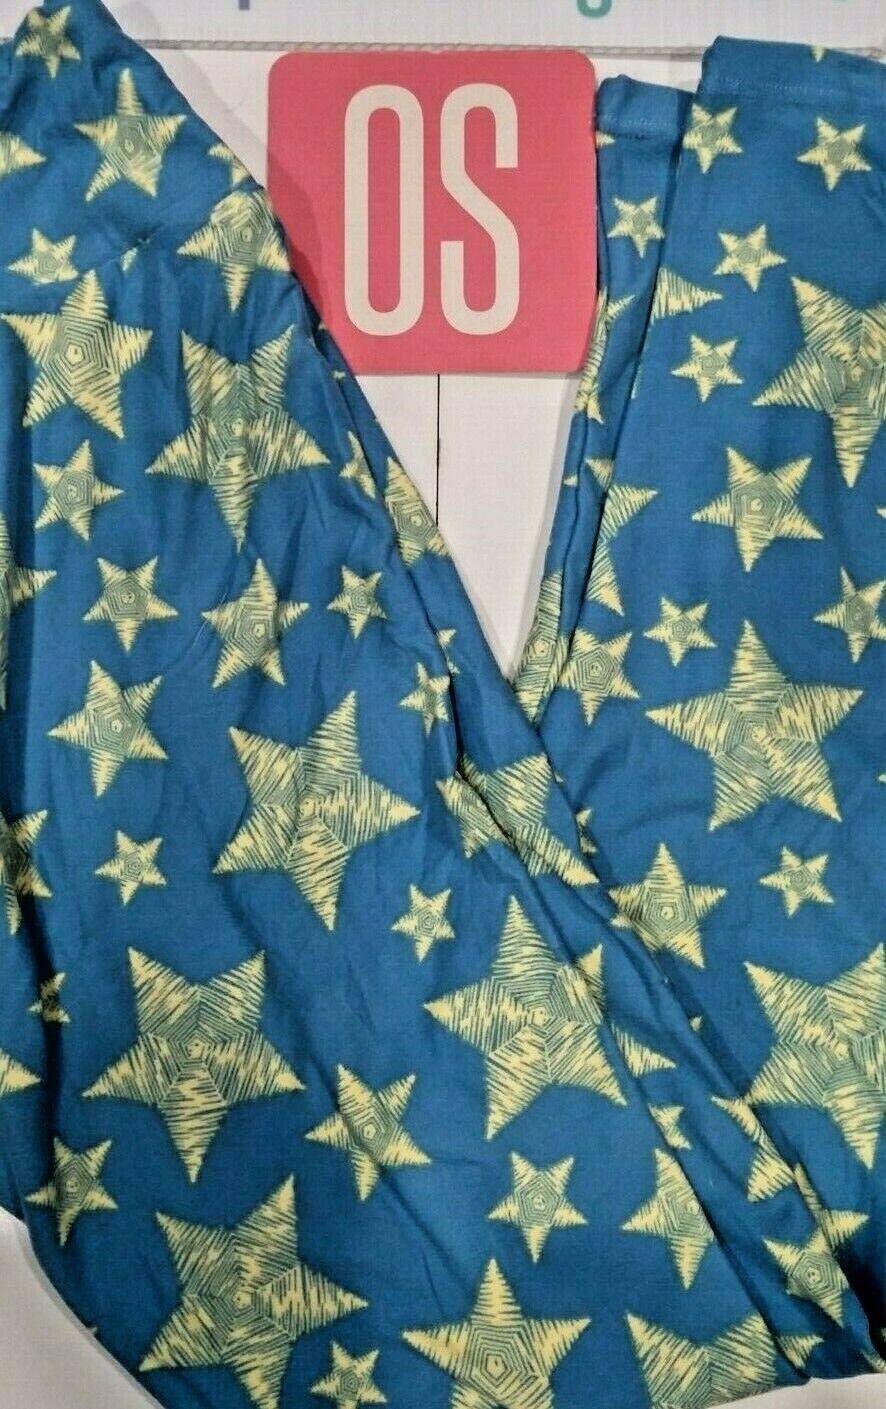 6e9546eb3297d4 LuLaRoe One Size Stars Americana America Leggings OS bluee White Beige